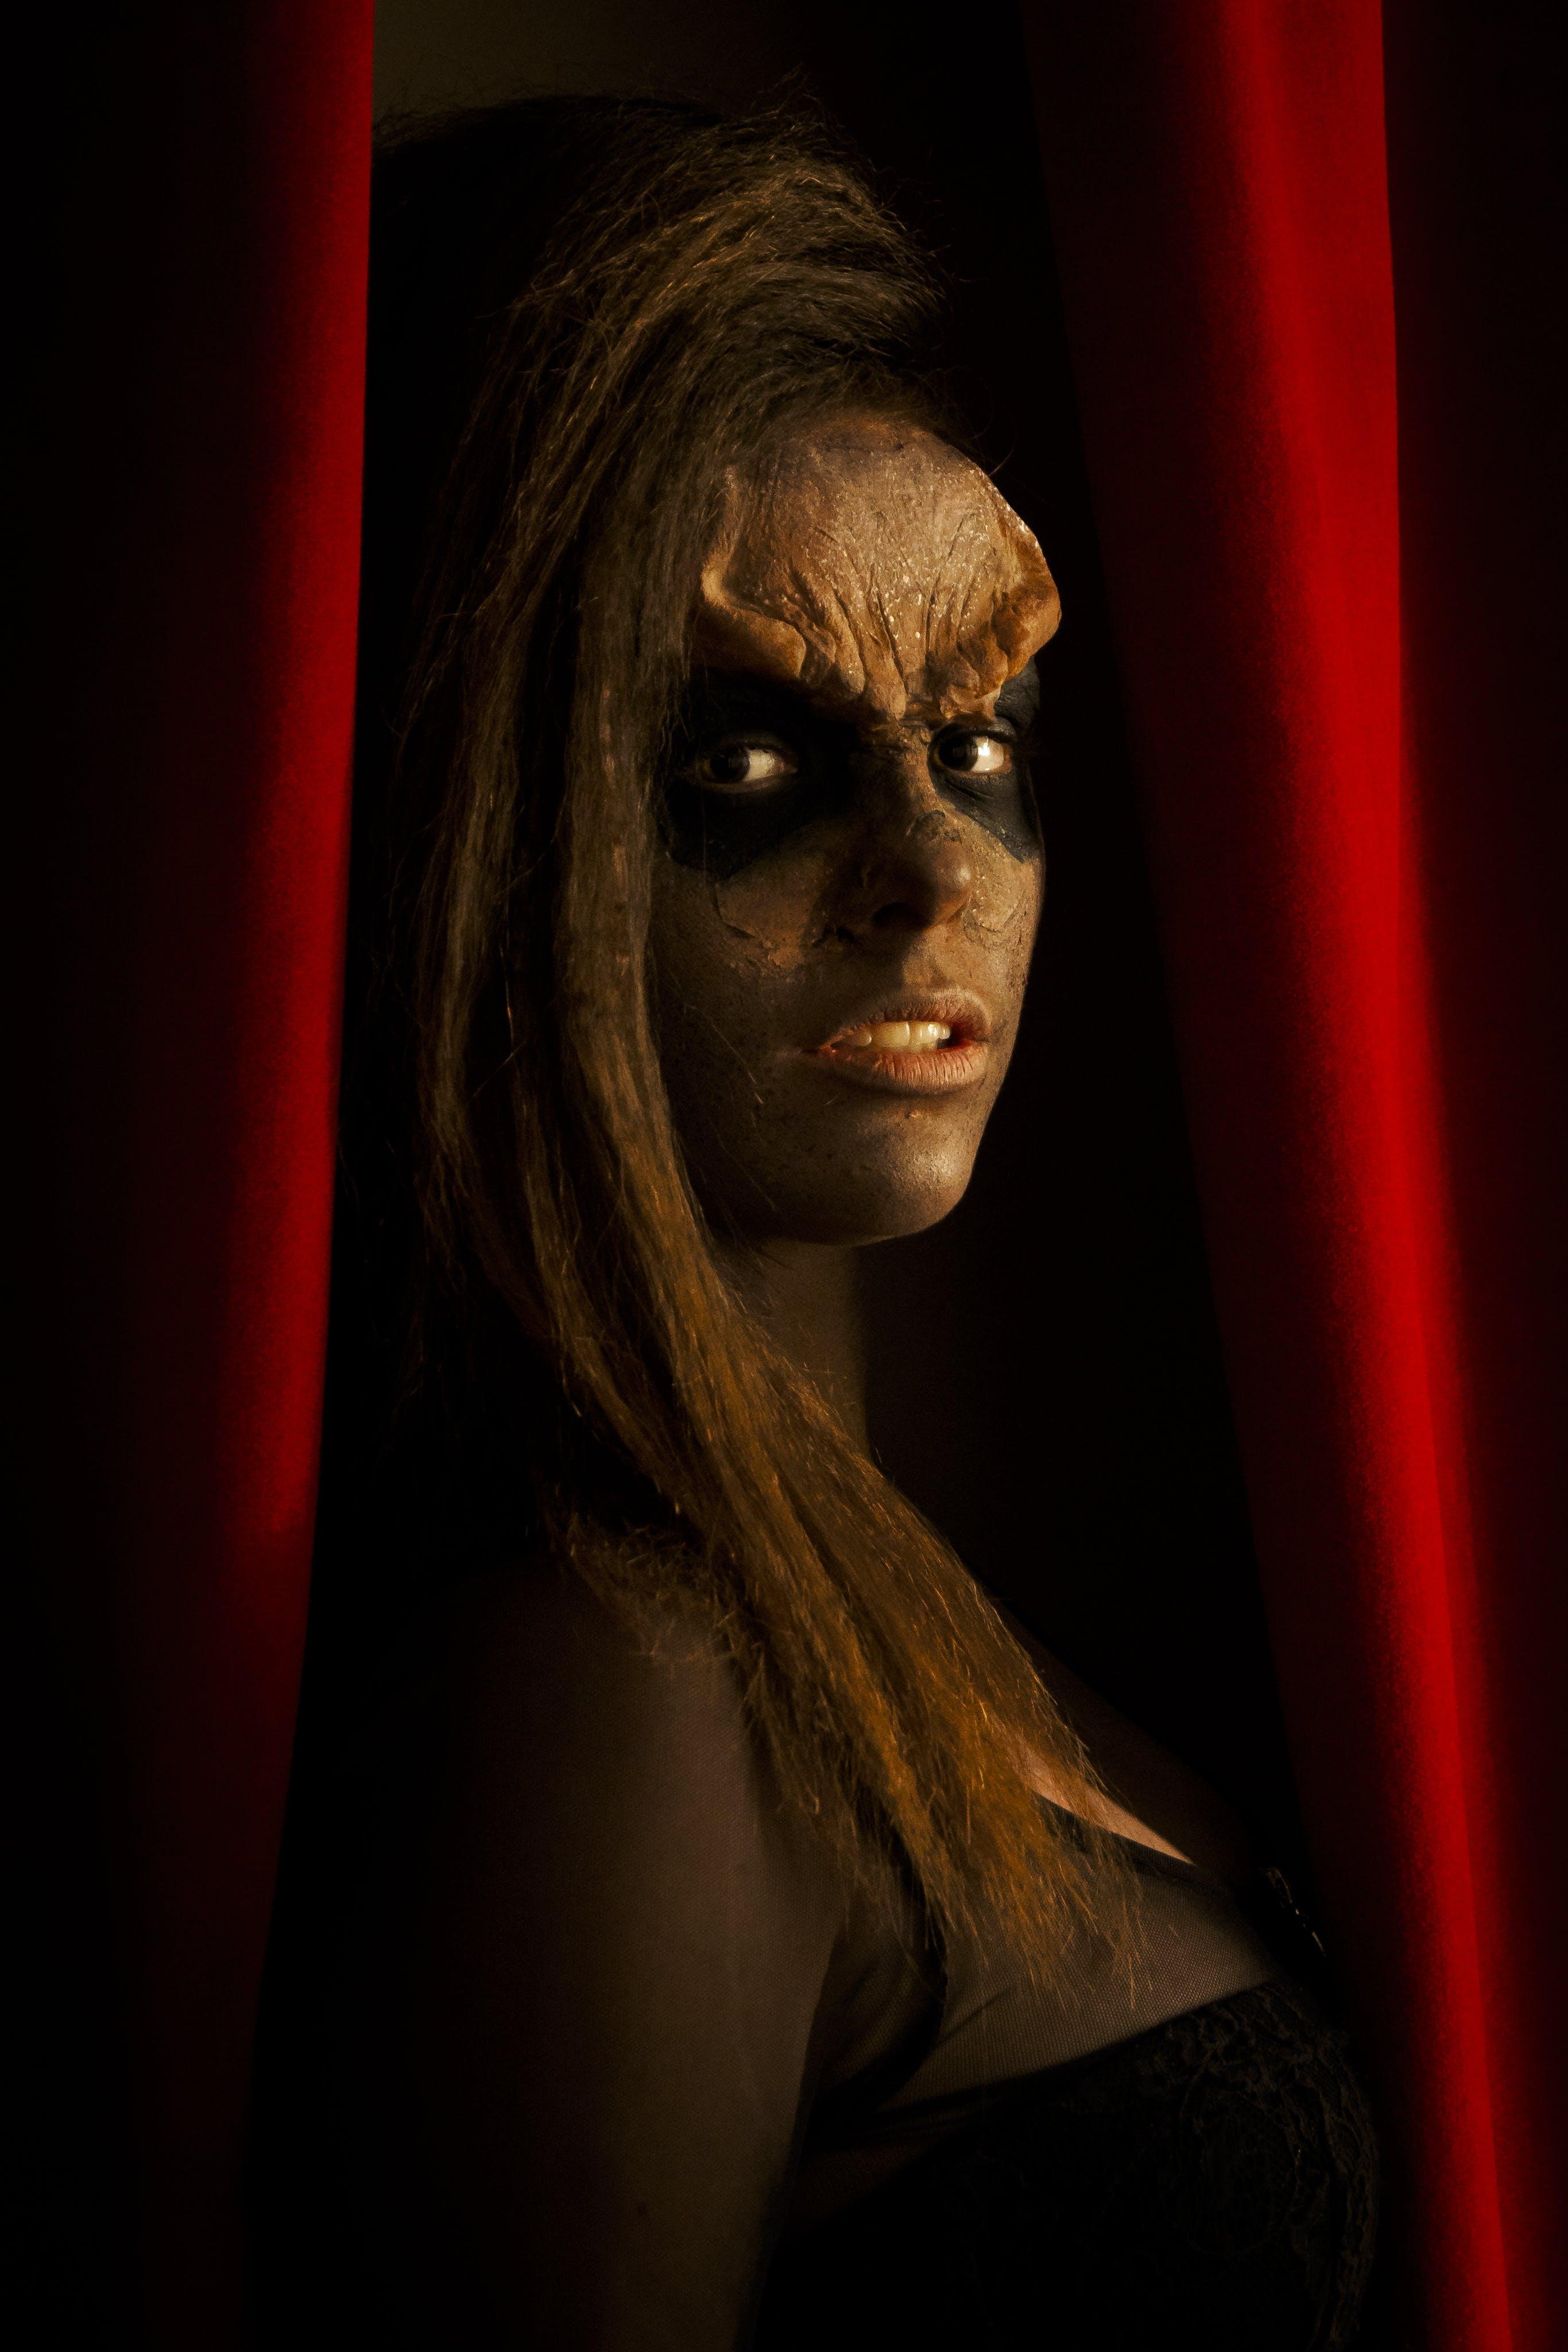 Free stock photo of face paint, body paint, star trek, klingon